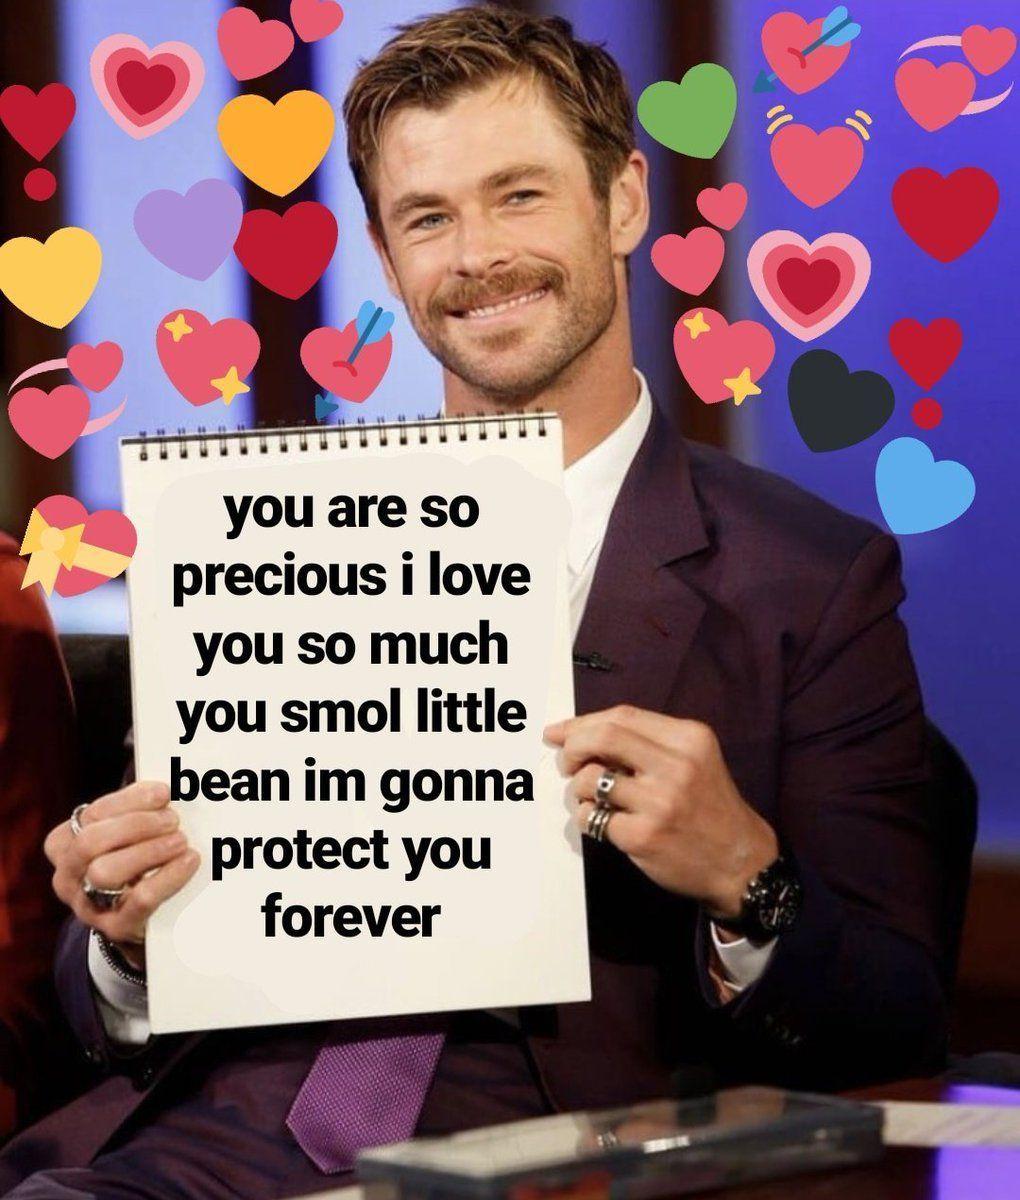 Assemble Avengers Chatroom Peter The Girlfriend Cute Love Memes Love Memes Marvel Funny